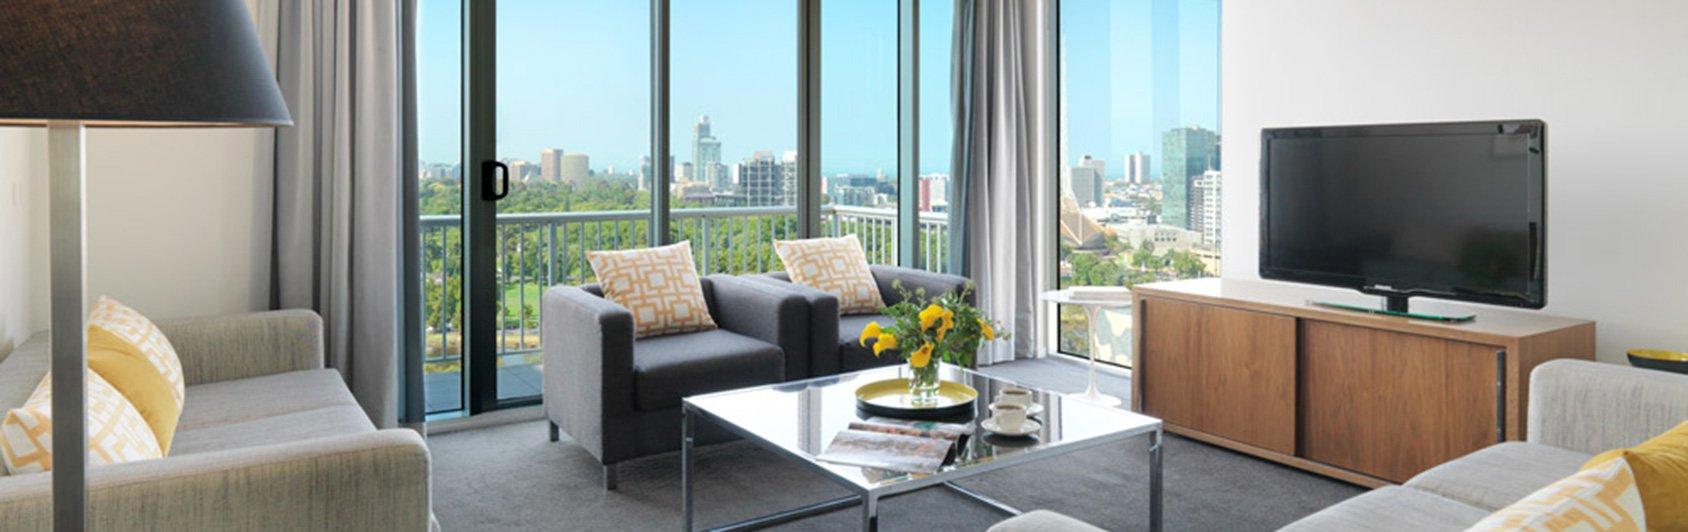 adina-melbourne-flinders-street-apartment-hotel.jpg